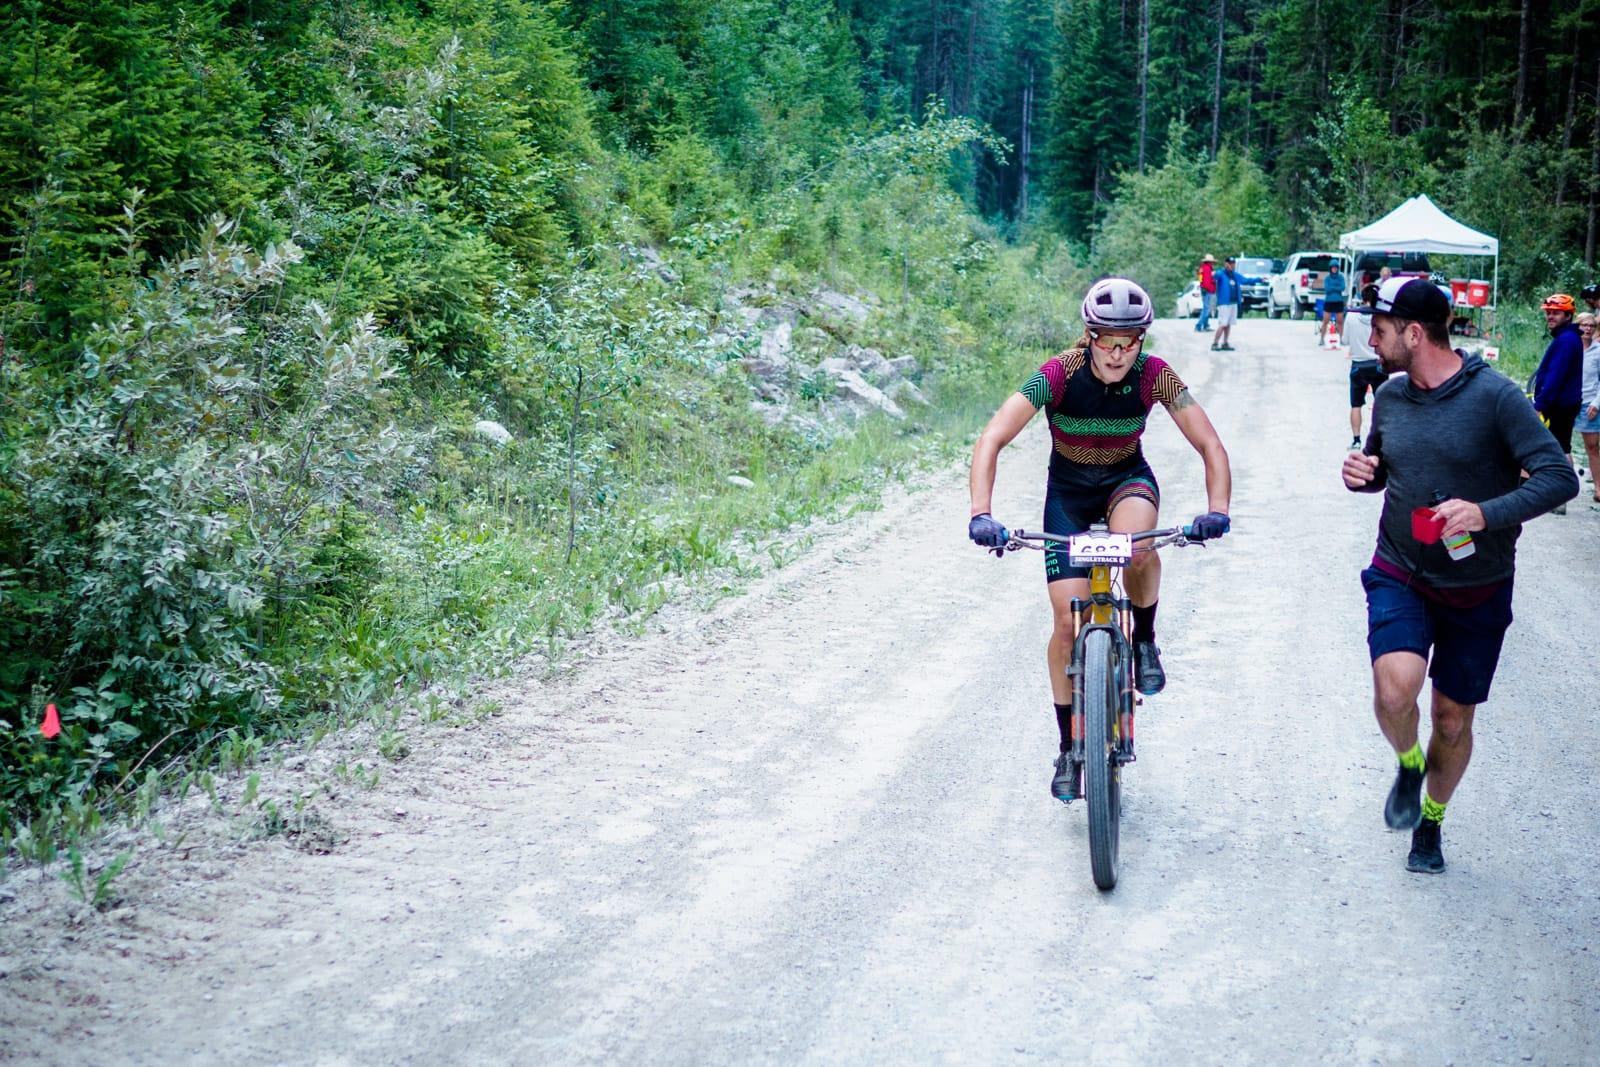 Santa Cruz Bicycles - Grinding Out the Miles at Singletrack6